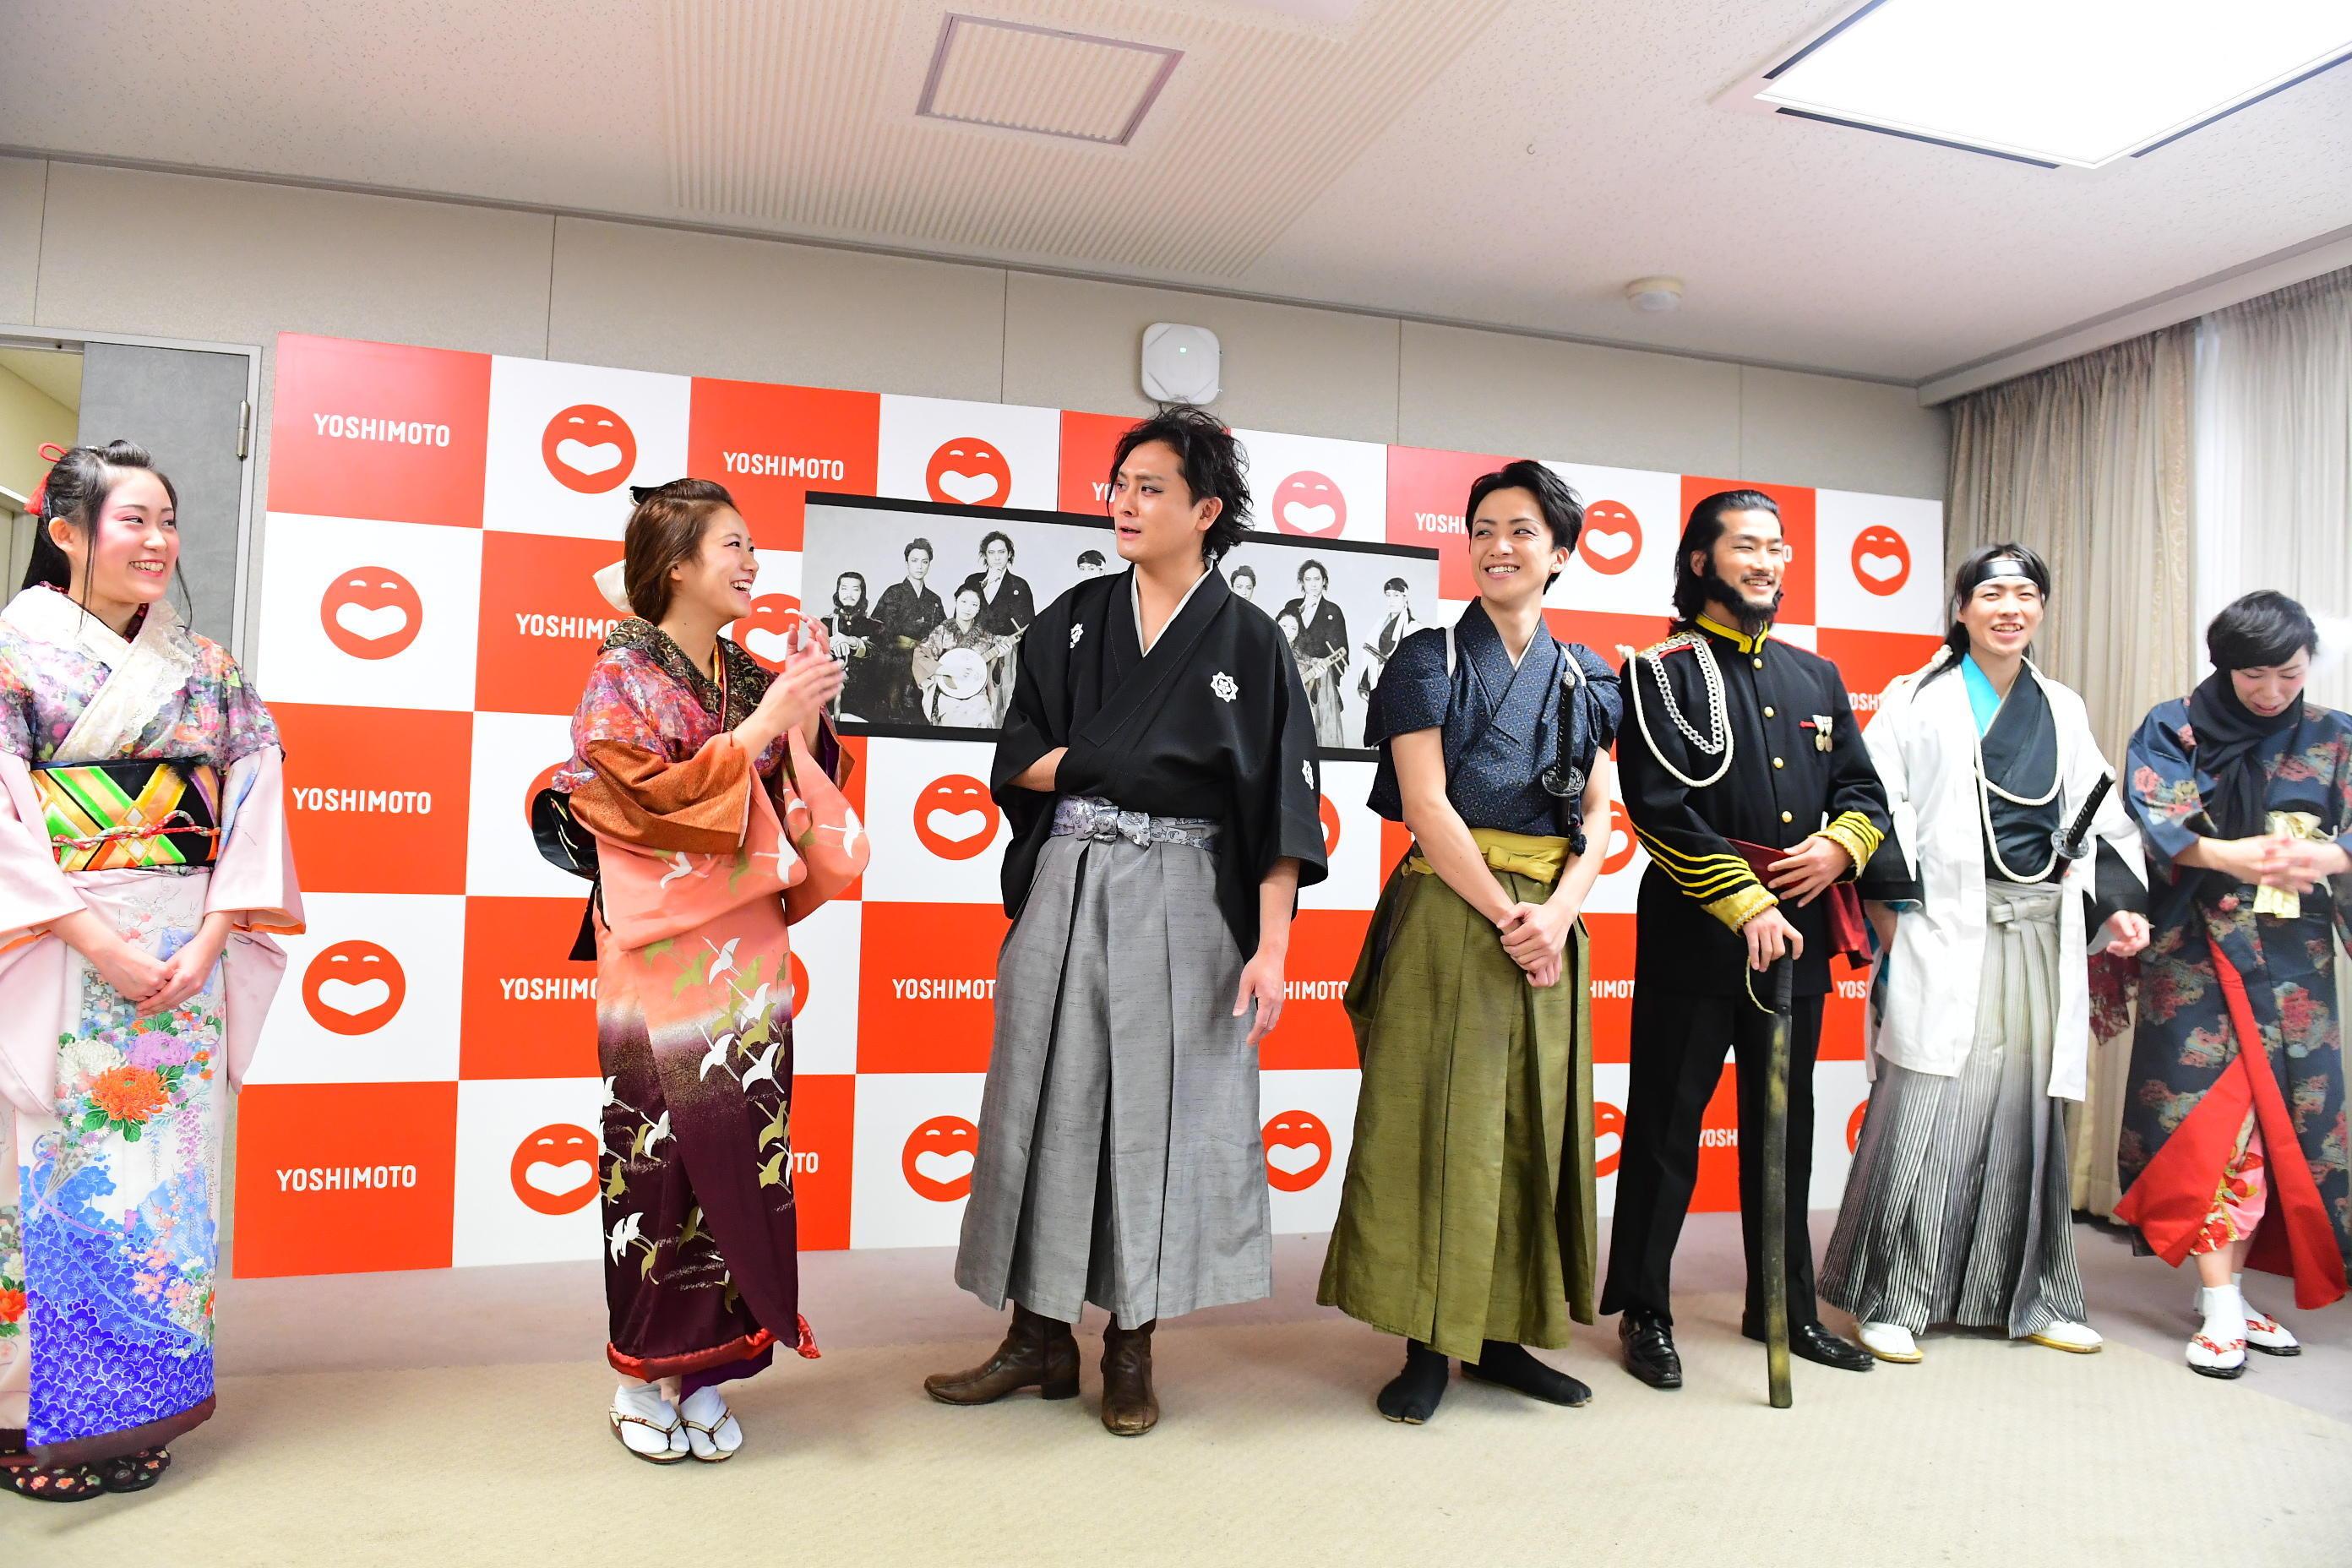 http://news.yoshimoto.co.jp/20170223194052-4bb3fd984808fee102e29387b0f7efa6ab780d3a.jpg